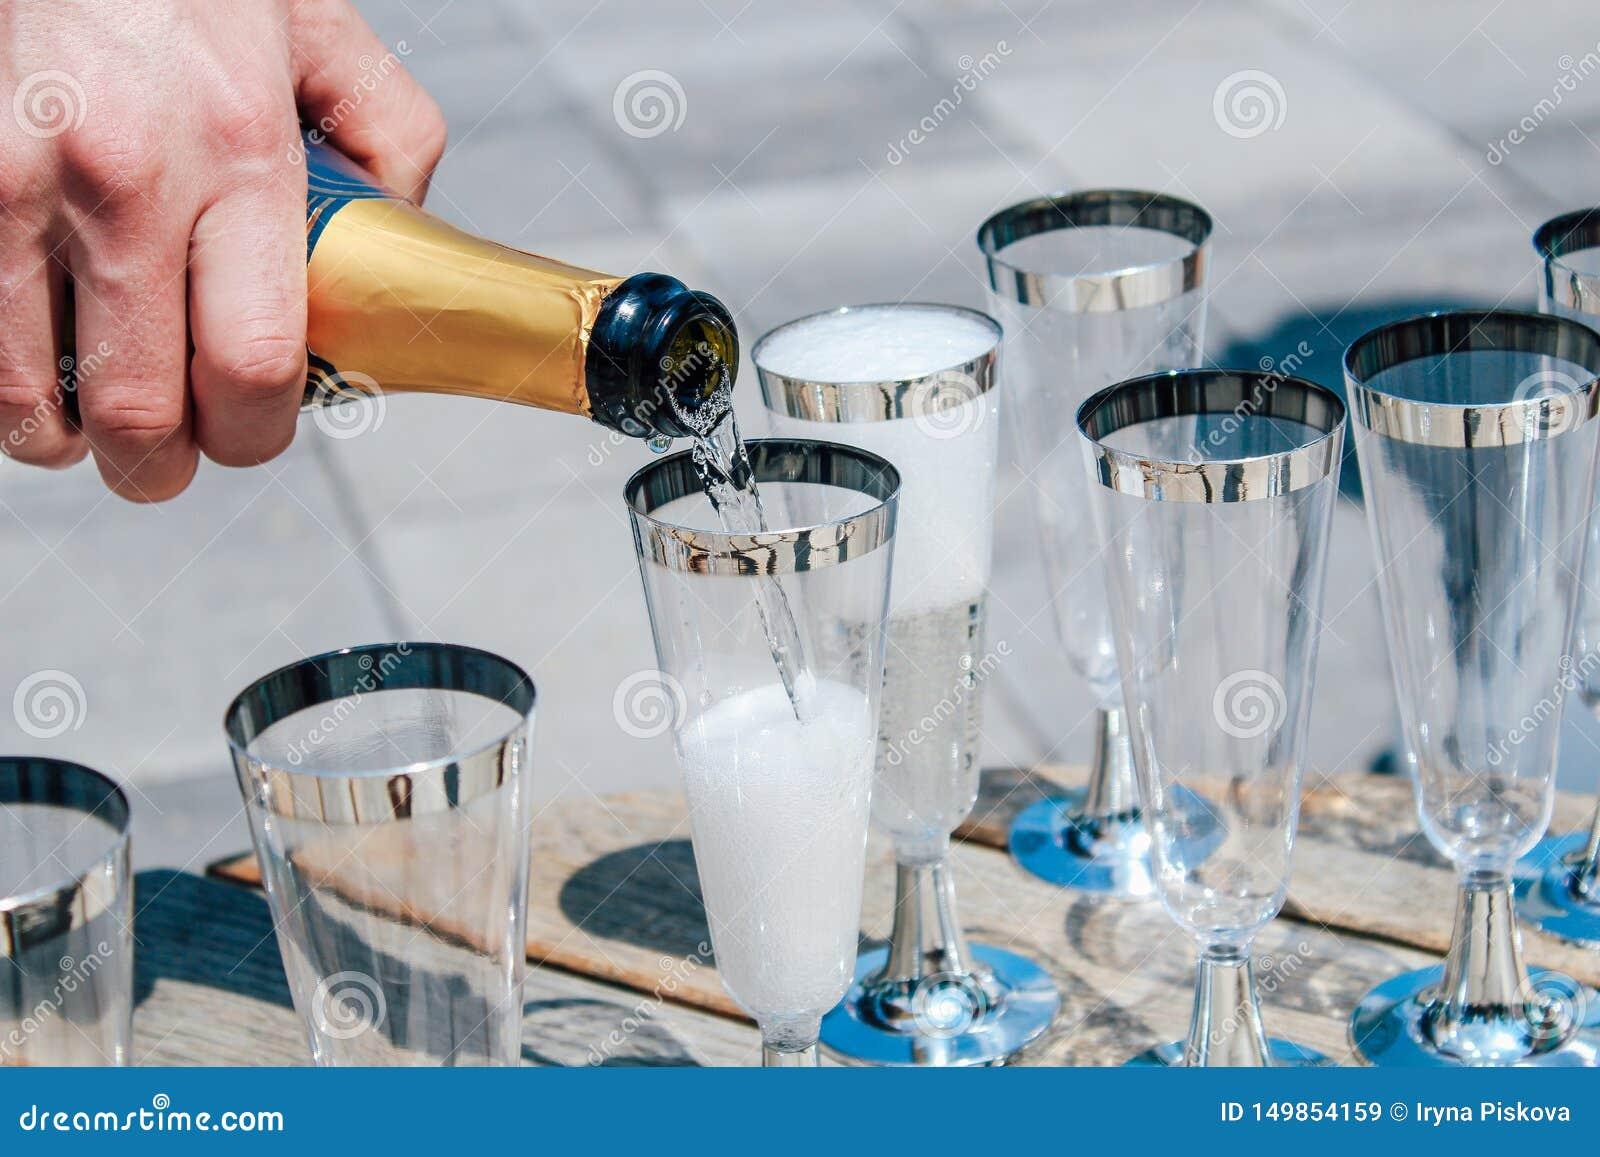 De mens giet champagne in glazen Close-up